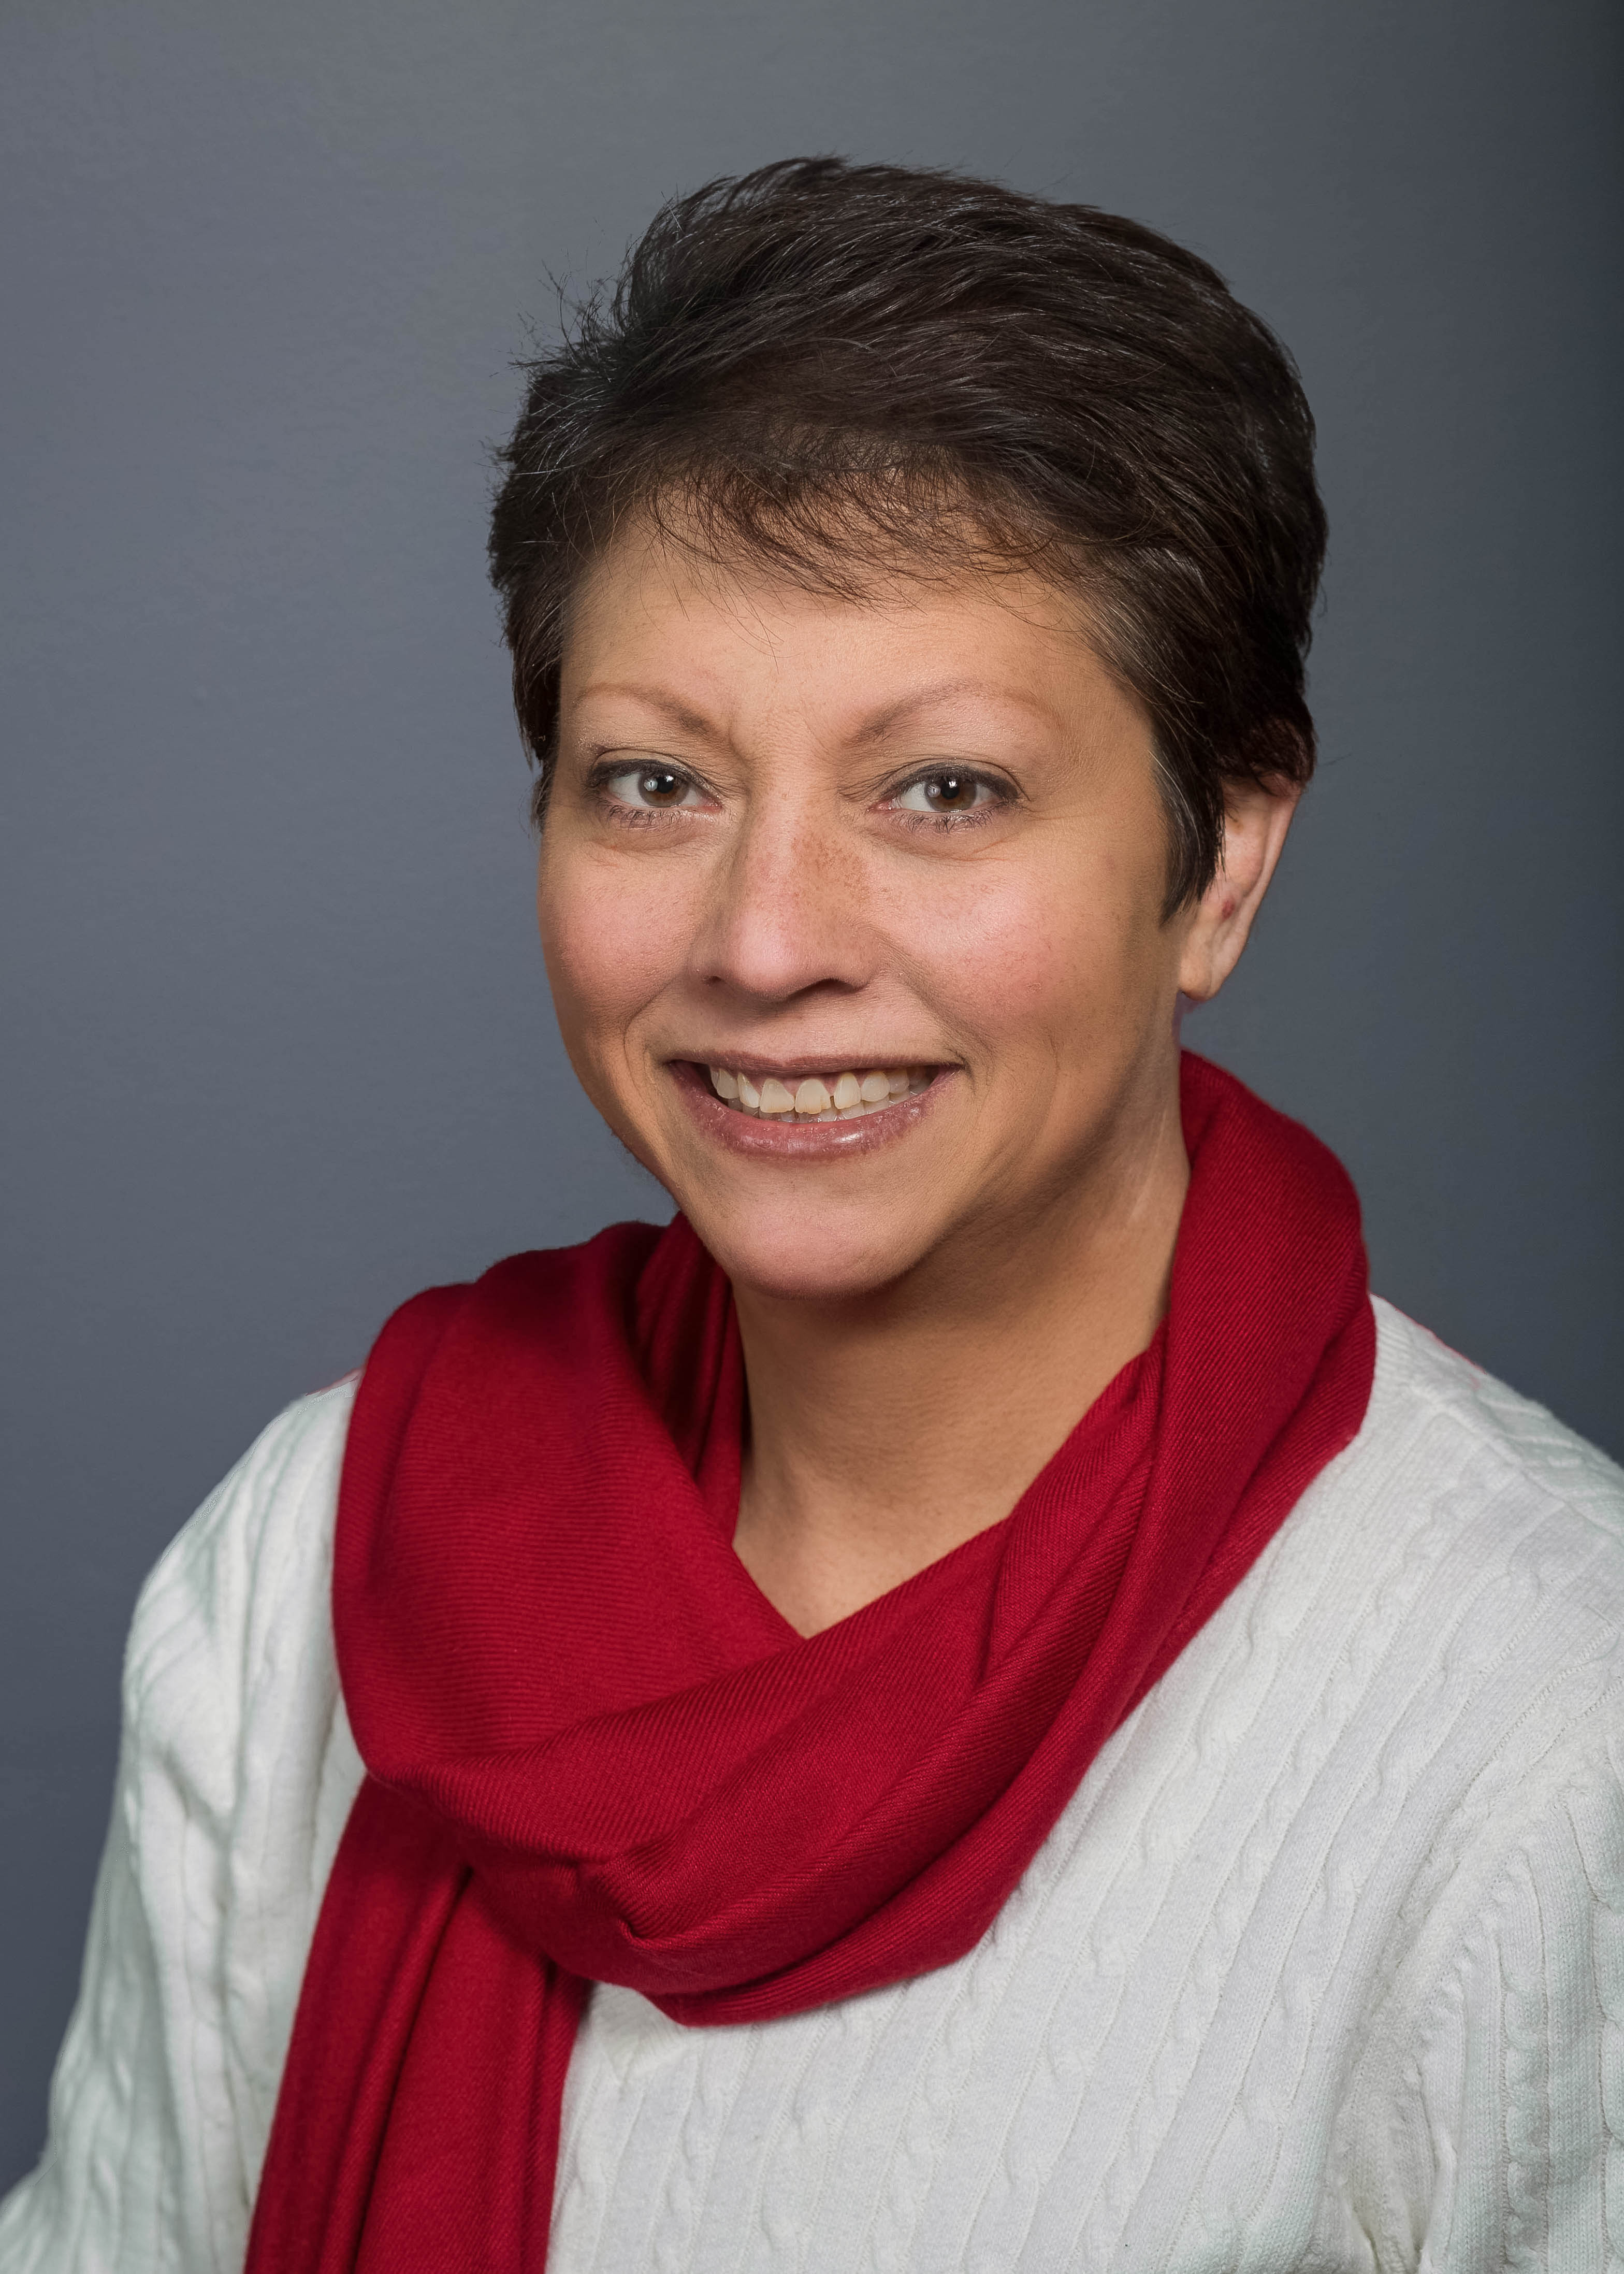 Rebecca Fuchs